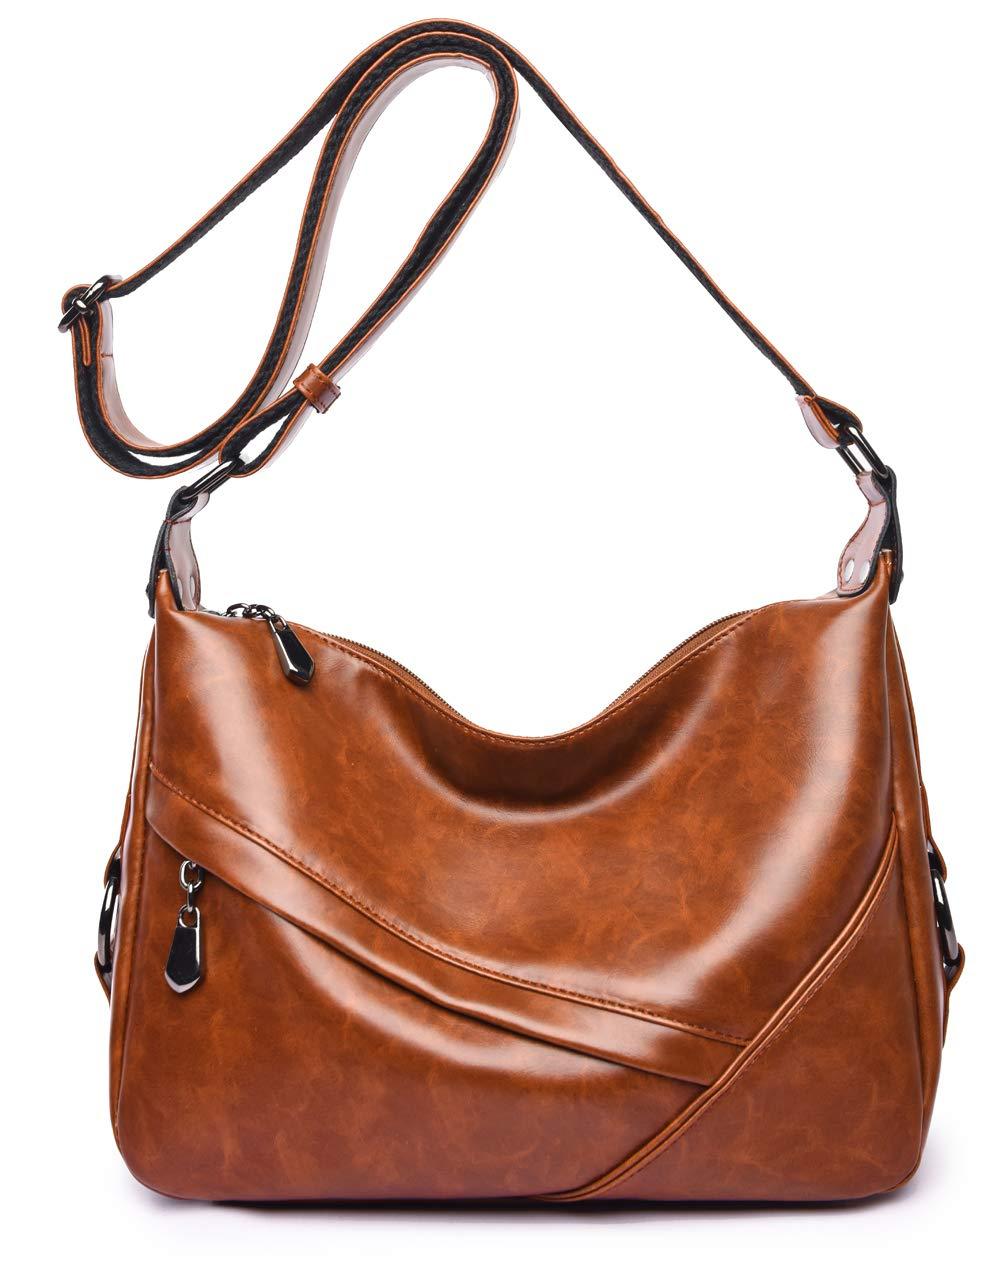 Women's Retro Sling Shoulder Bag from Covelin, Leather Crossbody Tote Handbag New Brown